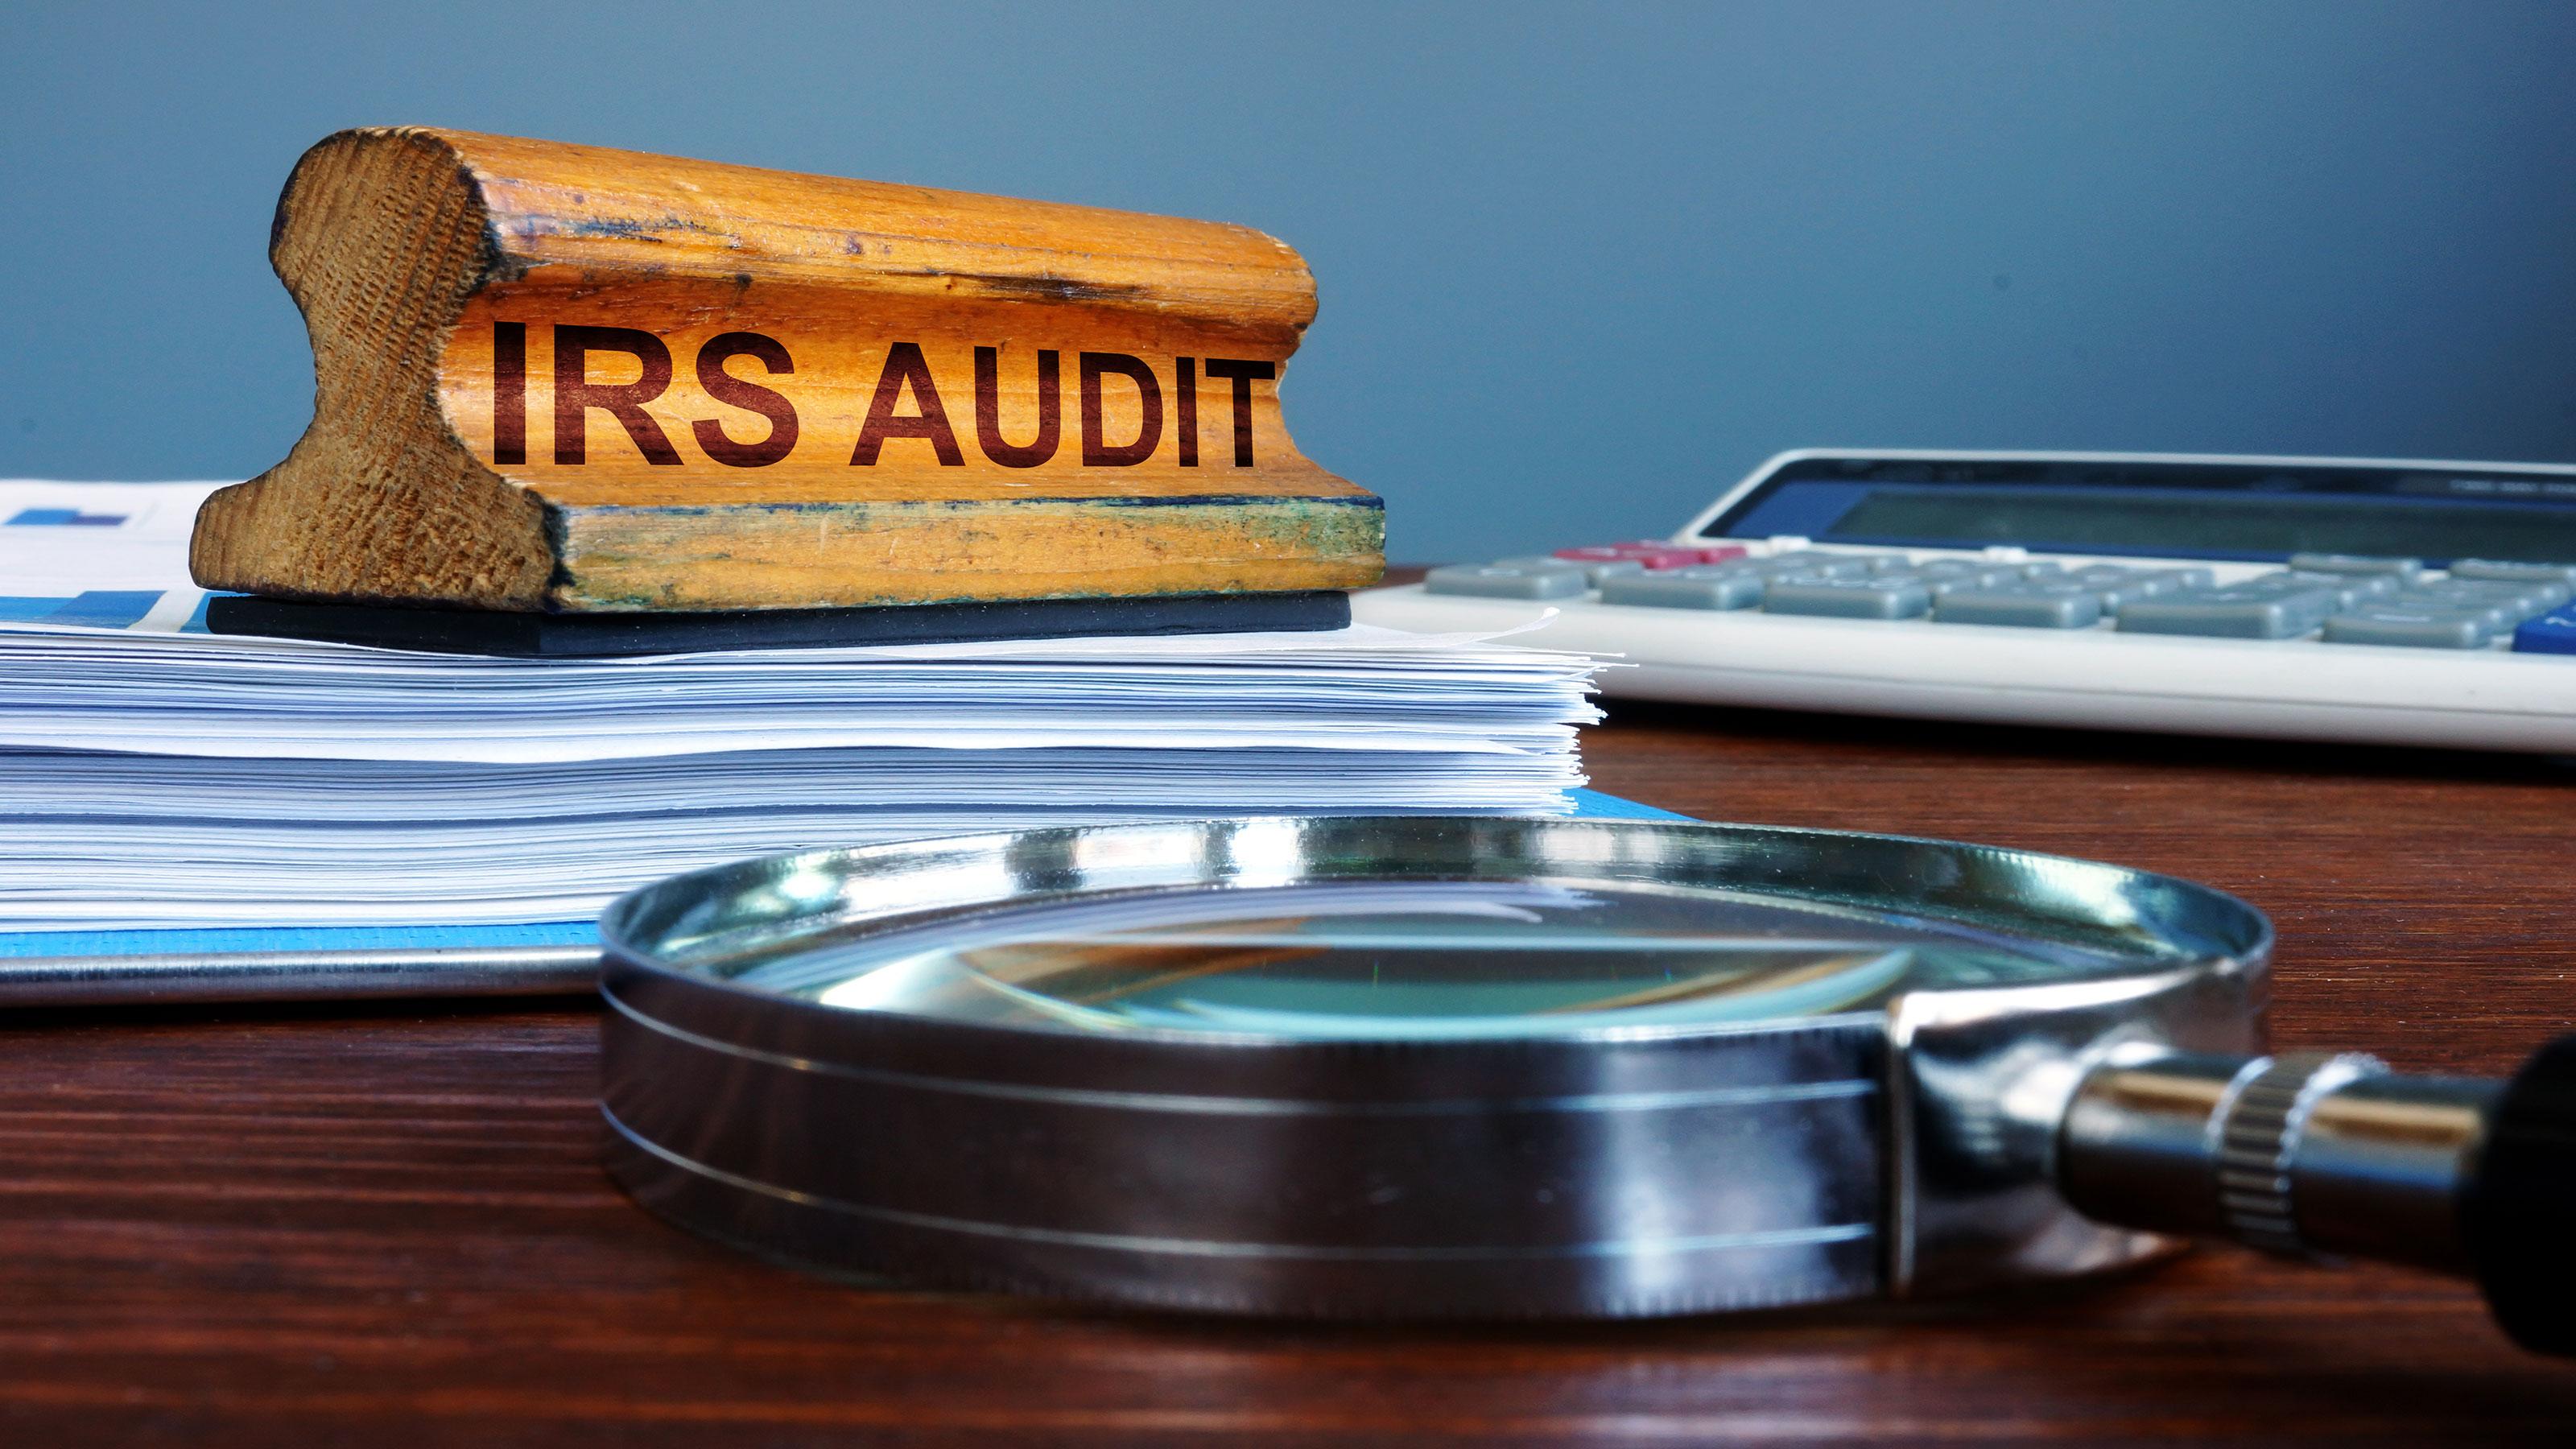 22 IRS Audit Red Flags | Kiplinger